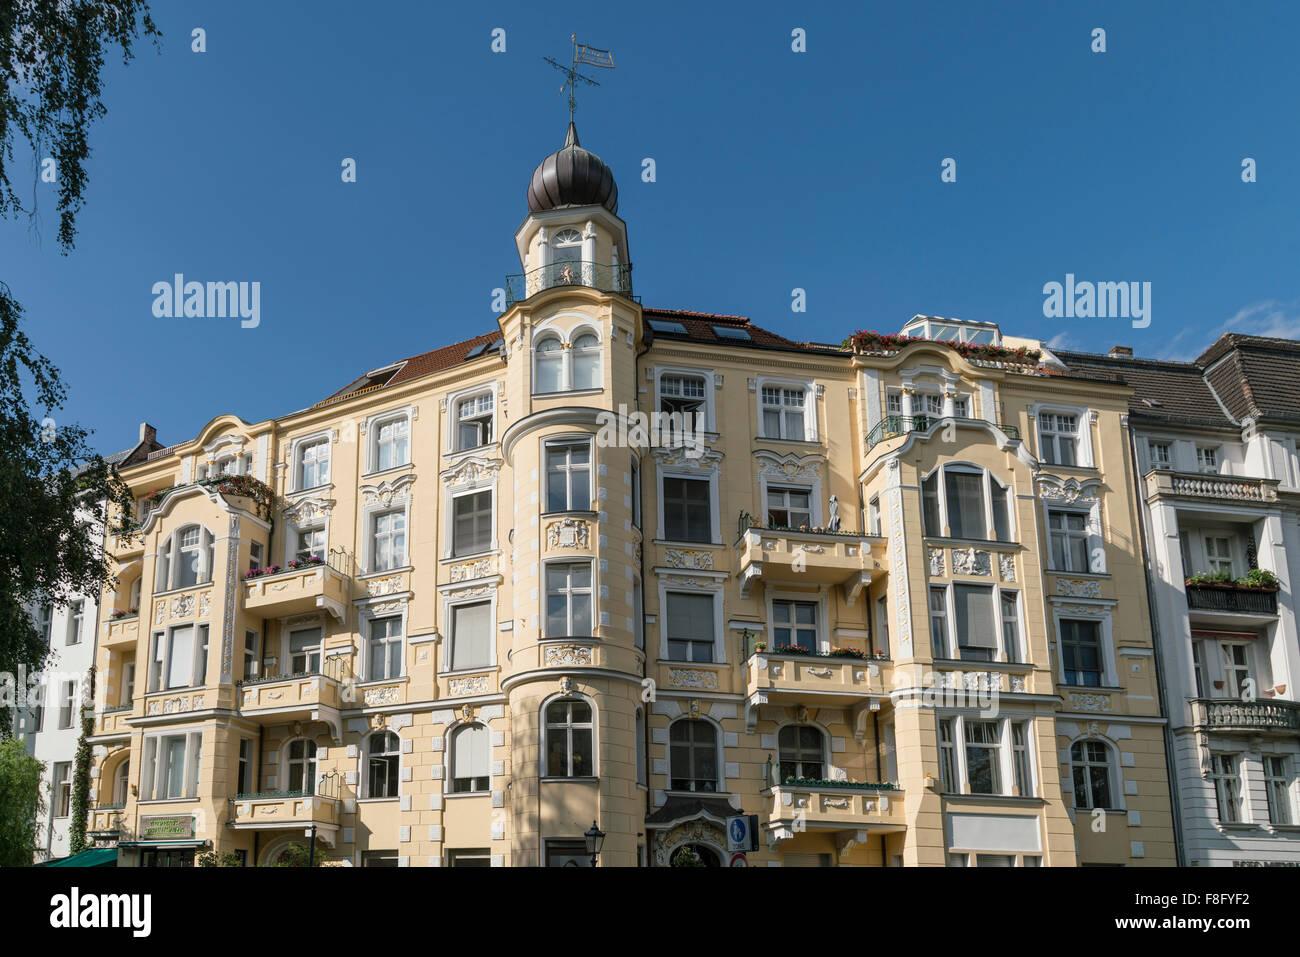 Real Estate, refurbished apartment house,  Victoria Luise Platz, Schoeneberg, Berlin - Stock Image